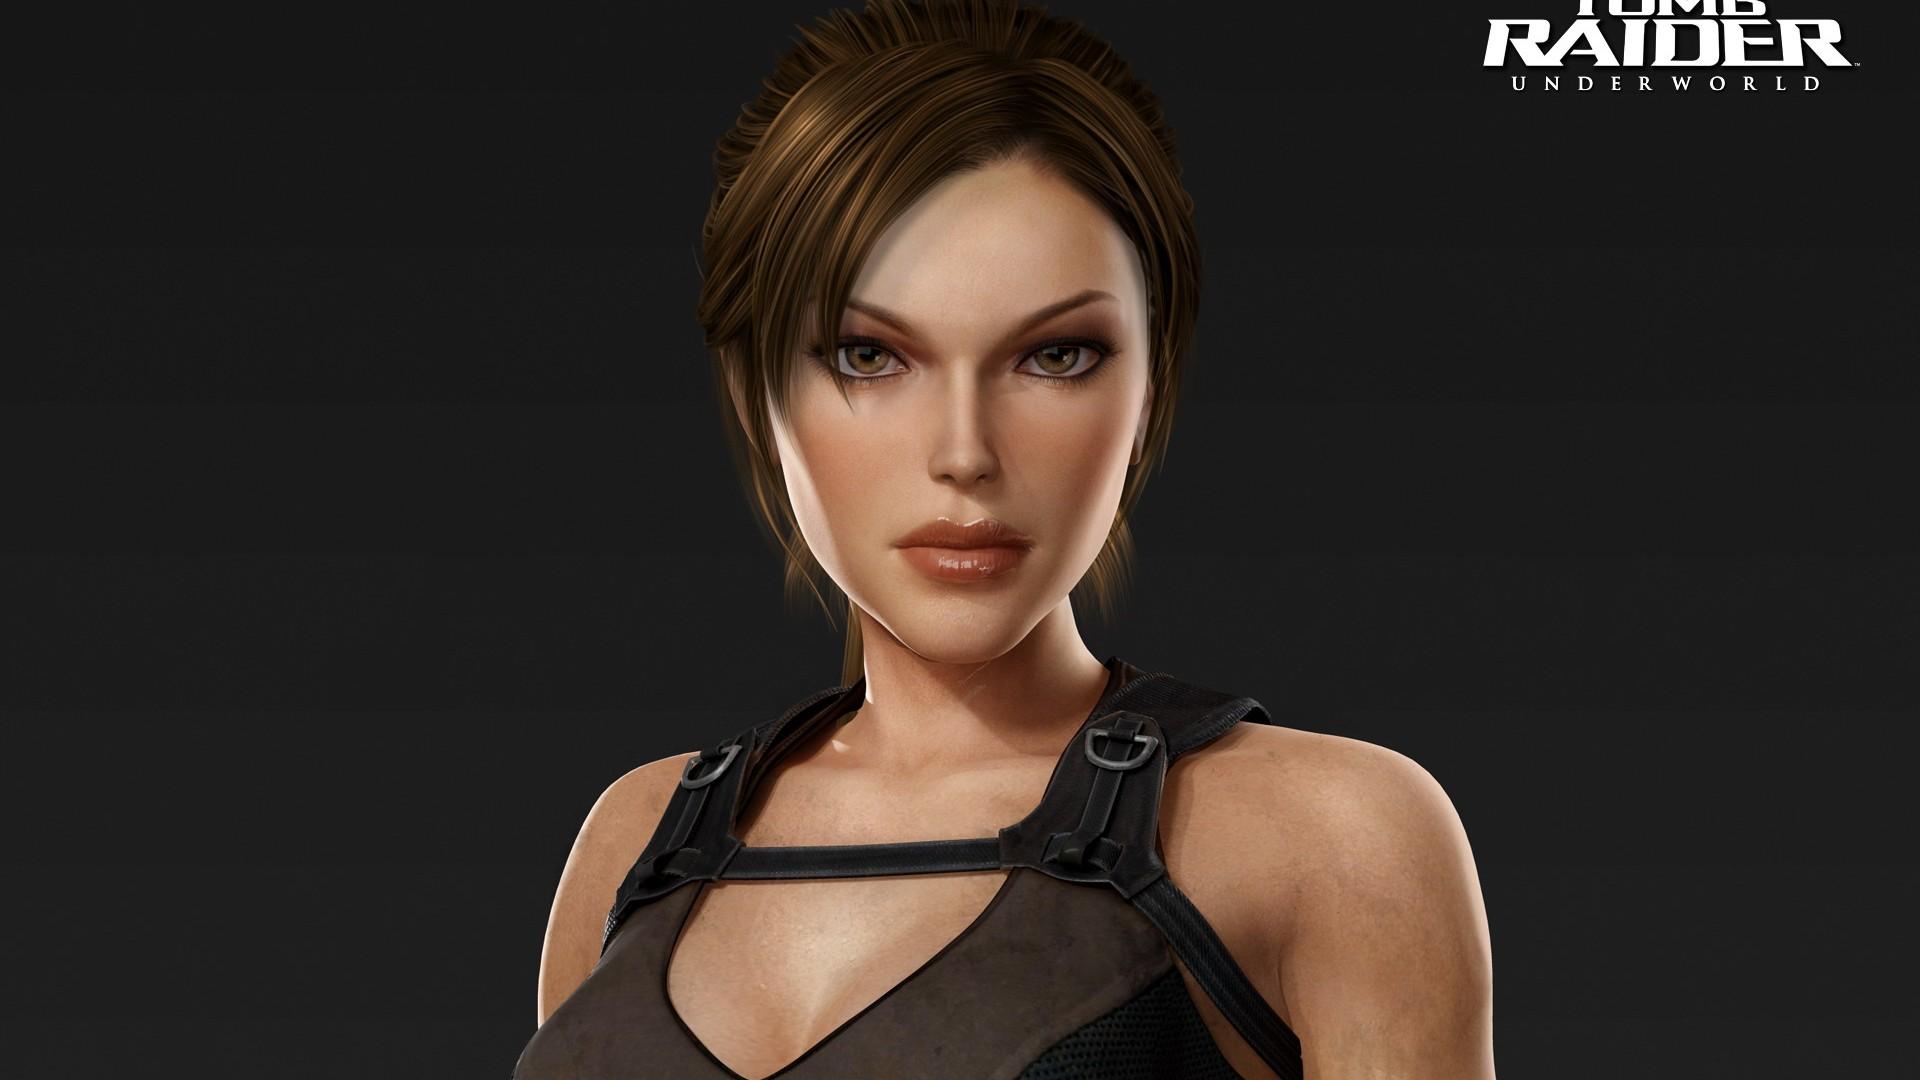 Lara croft underworld nude streaming